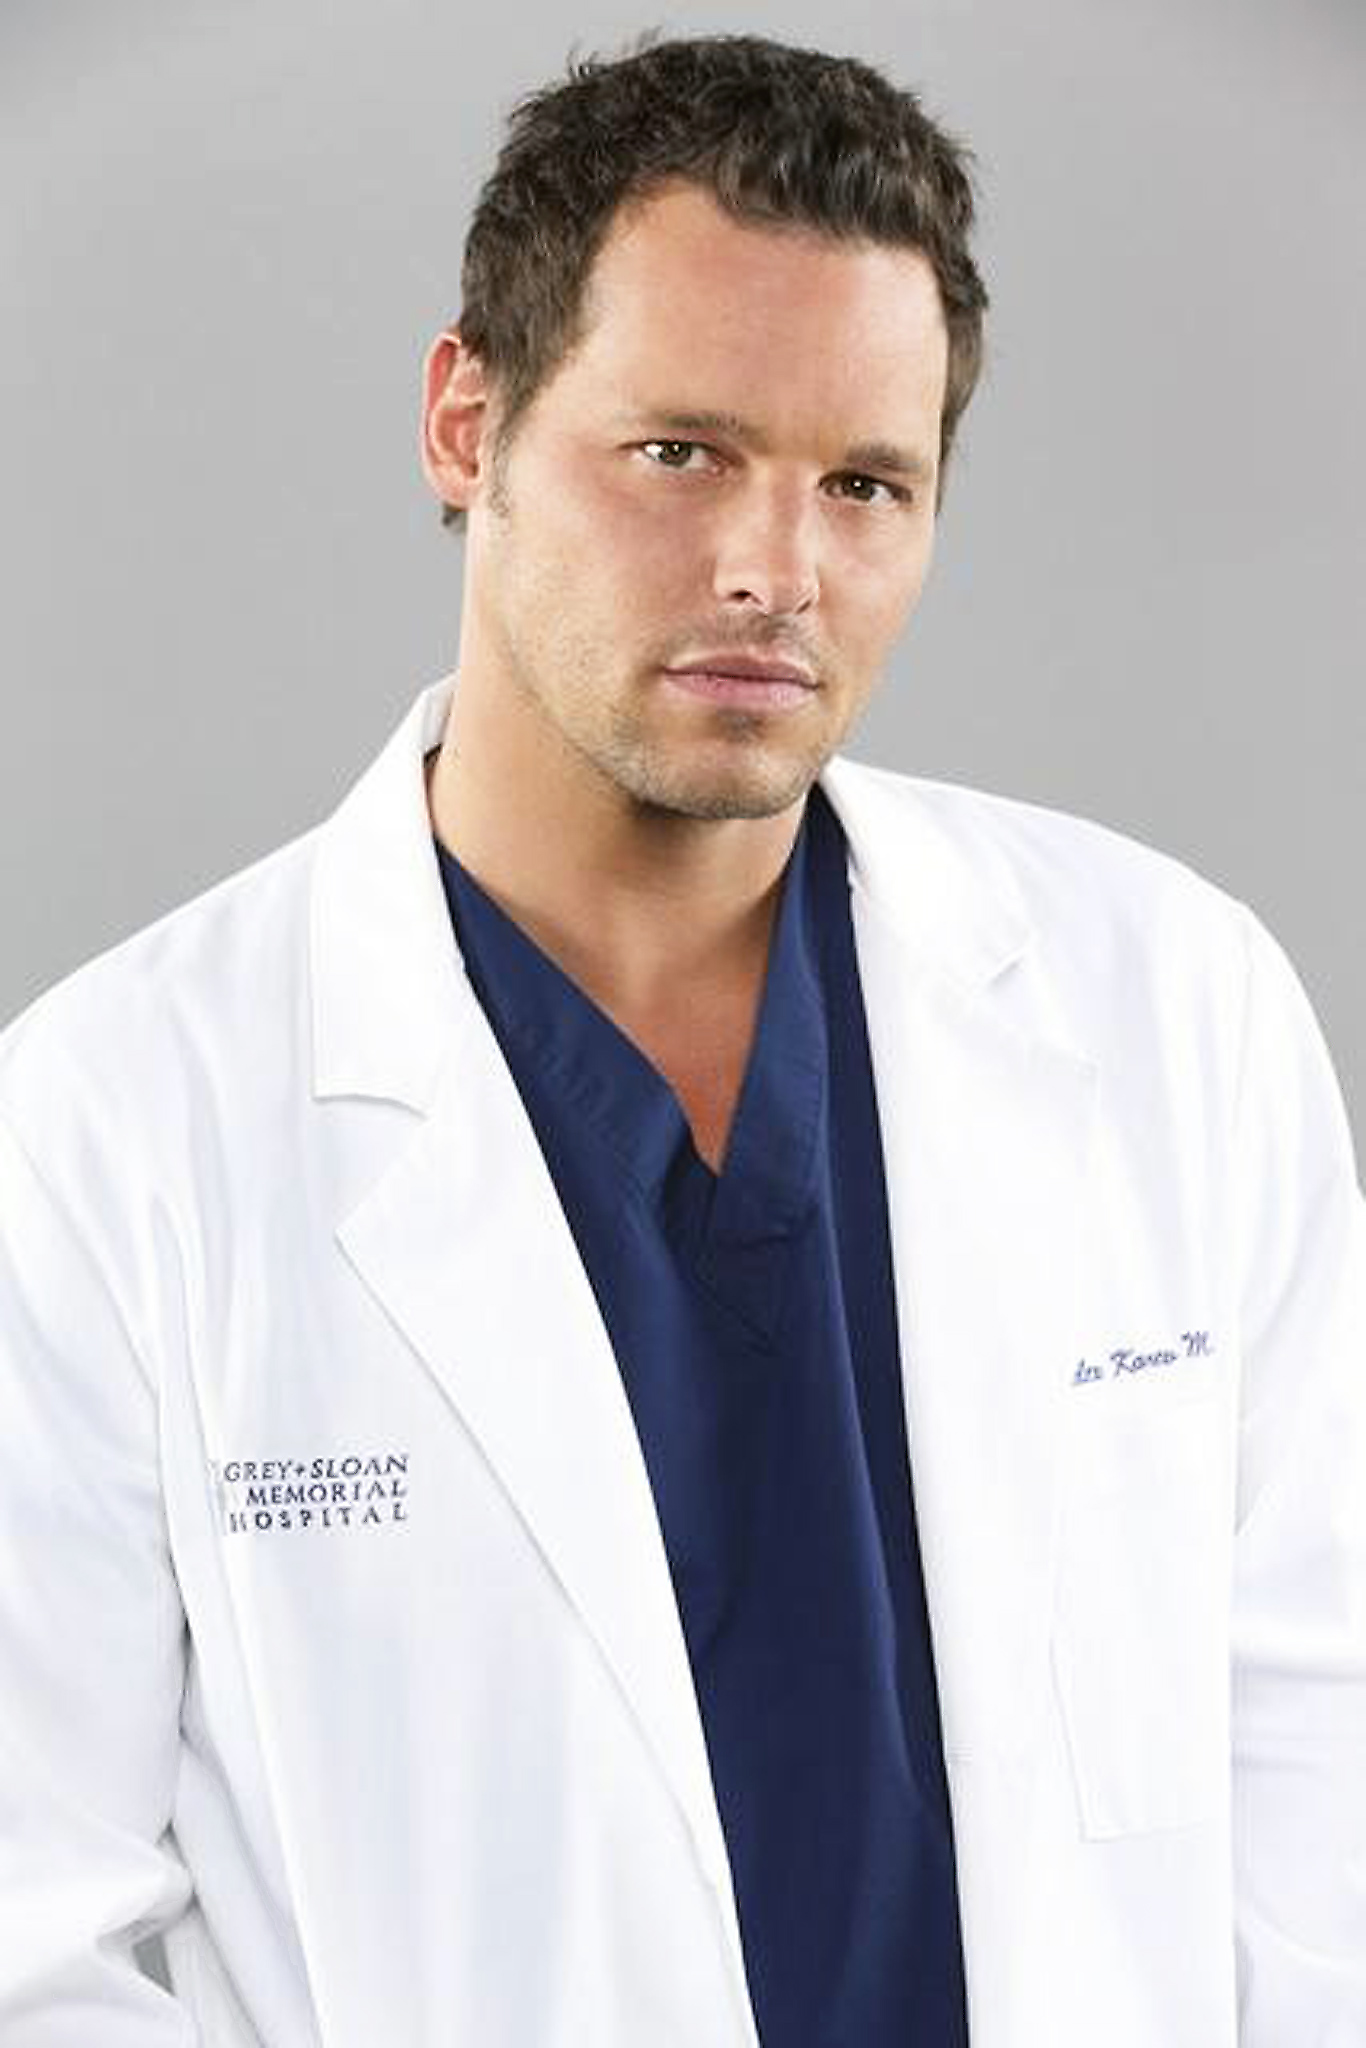 Greys-Anatomy-Audition-Justin-Chambers1.jpg